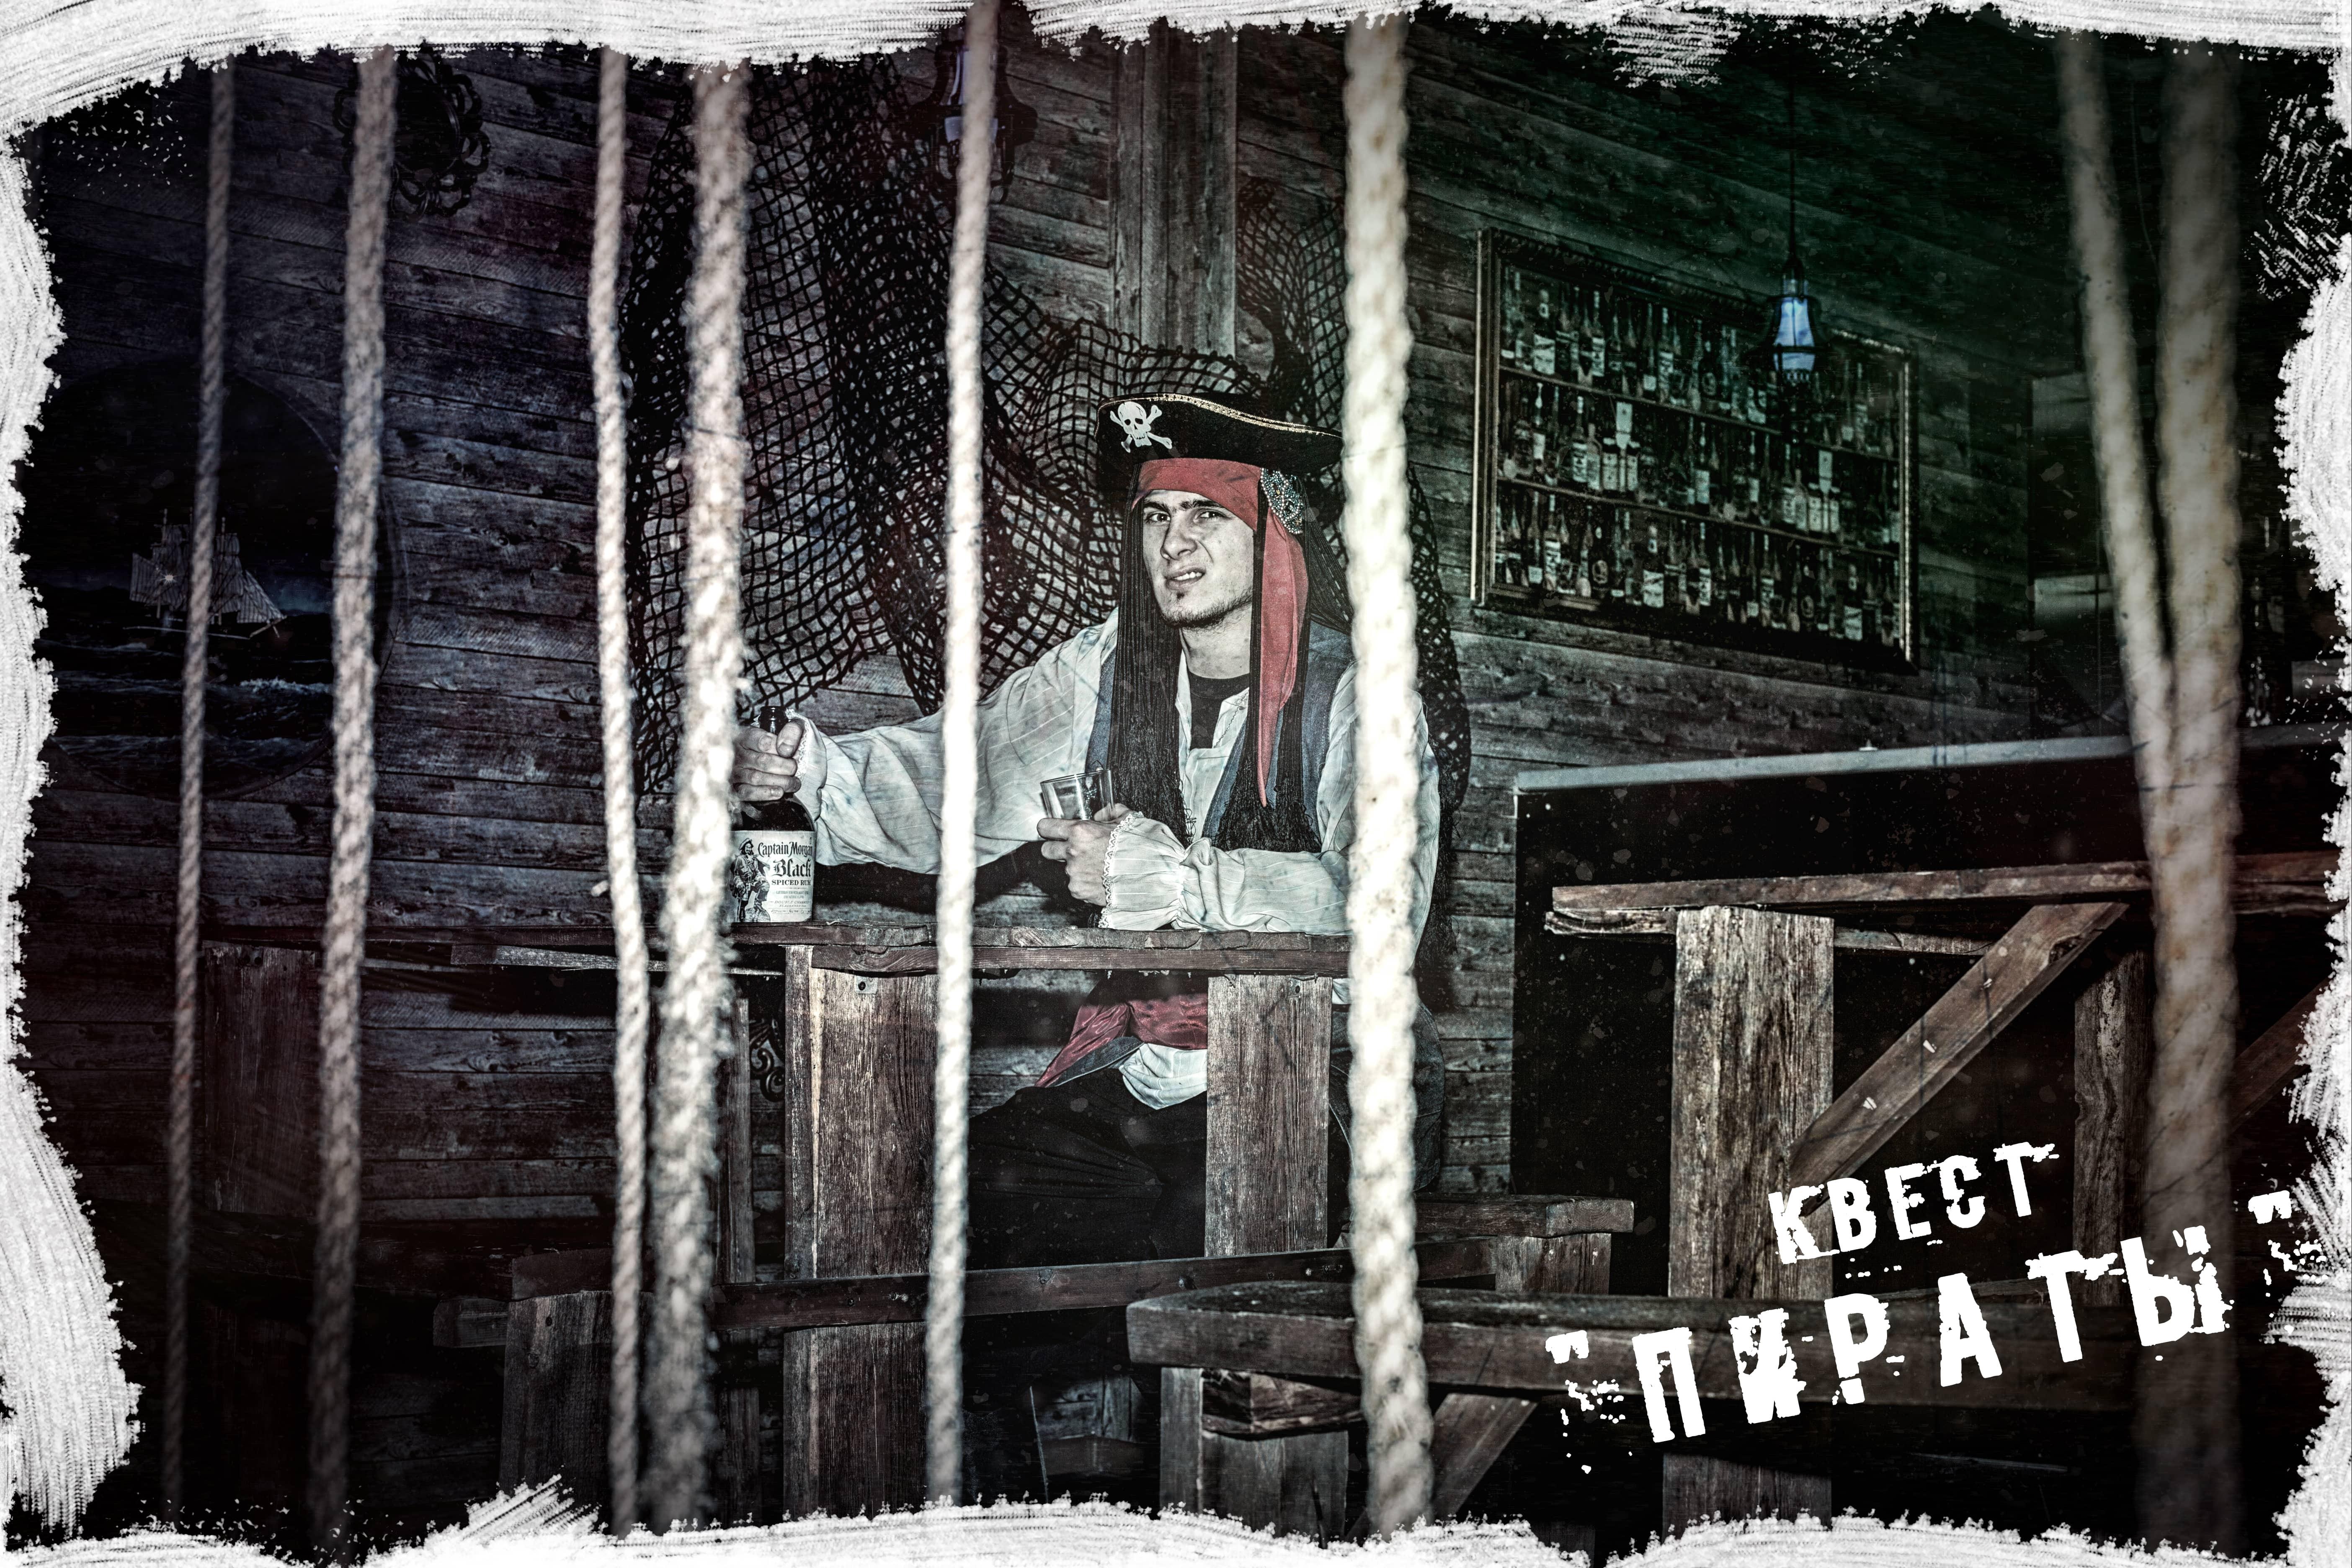 Квест Иркутск Пираты (9)